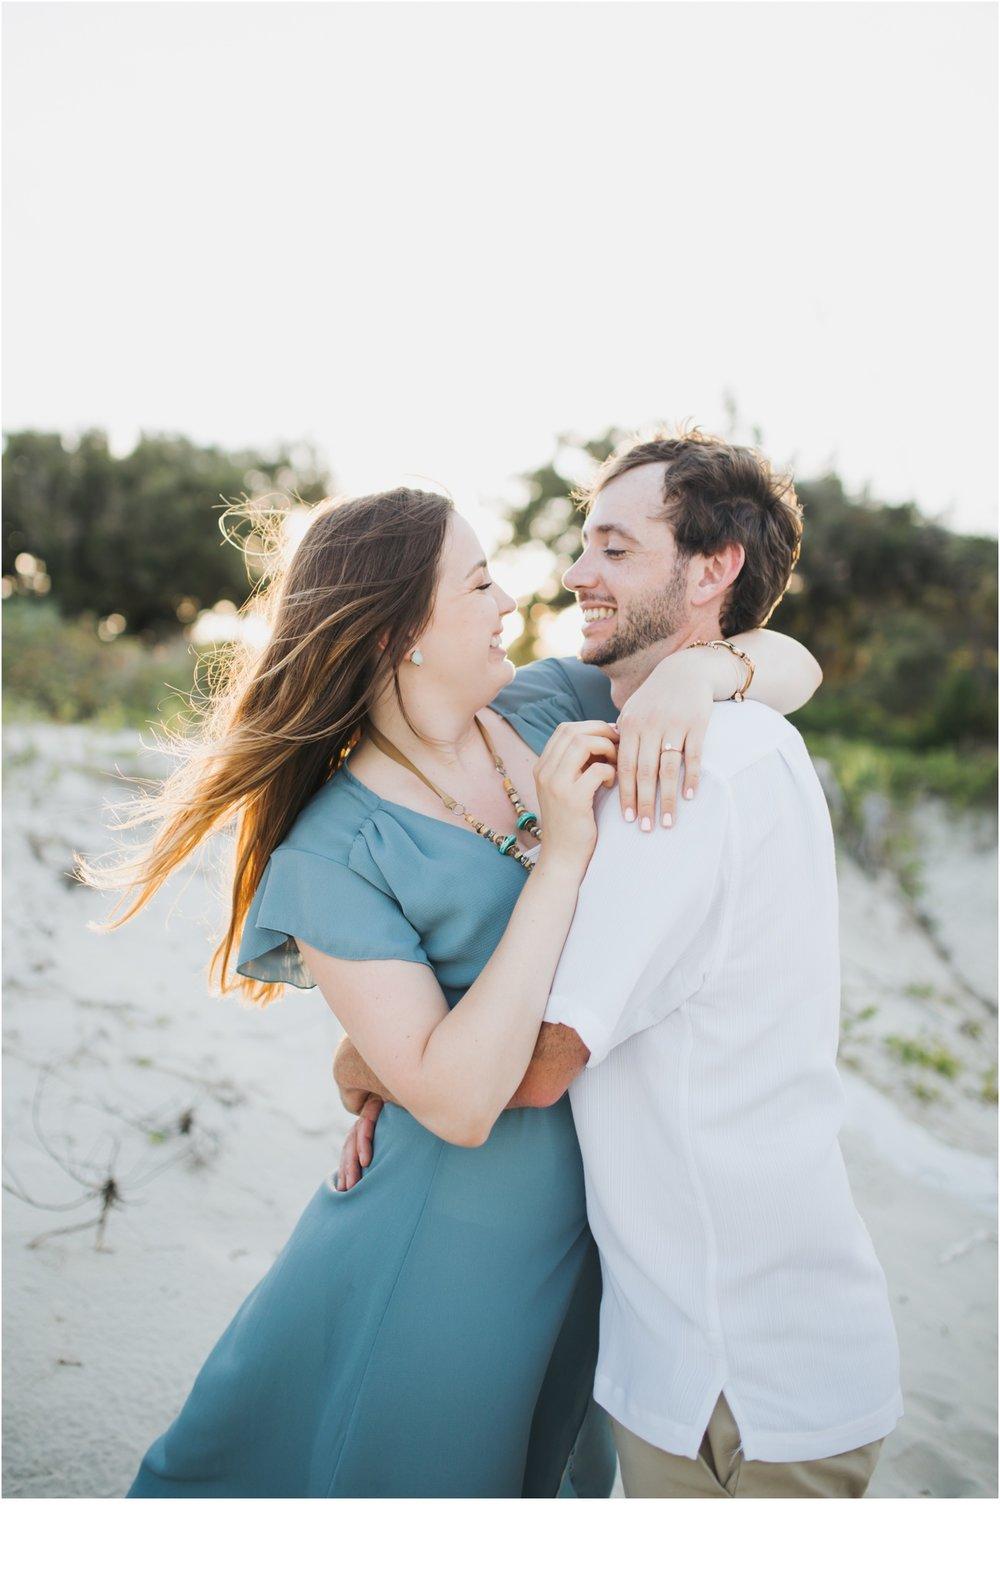 Rainey_Gregg_Photography_St._Simons_Island_Georgia_California_Wedding_Portrait_Photography_1161.jpg